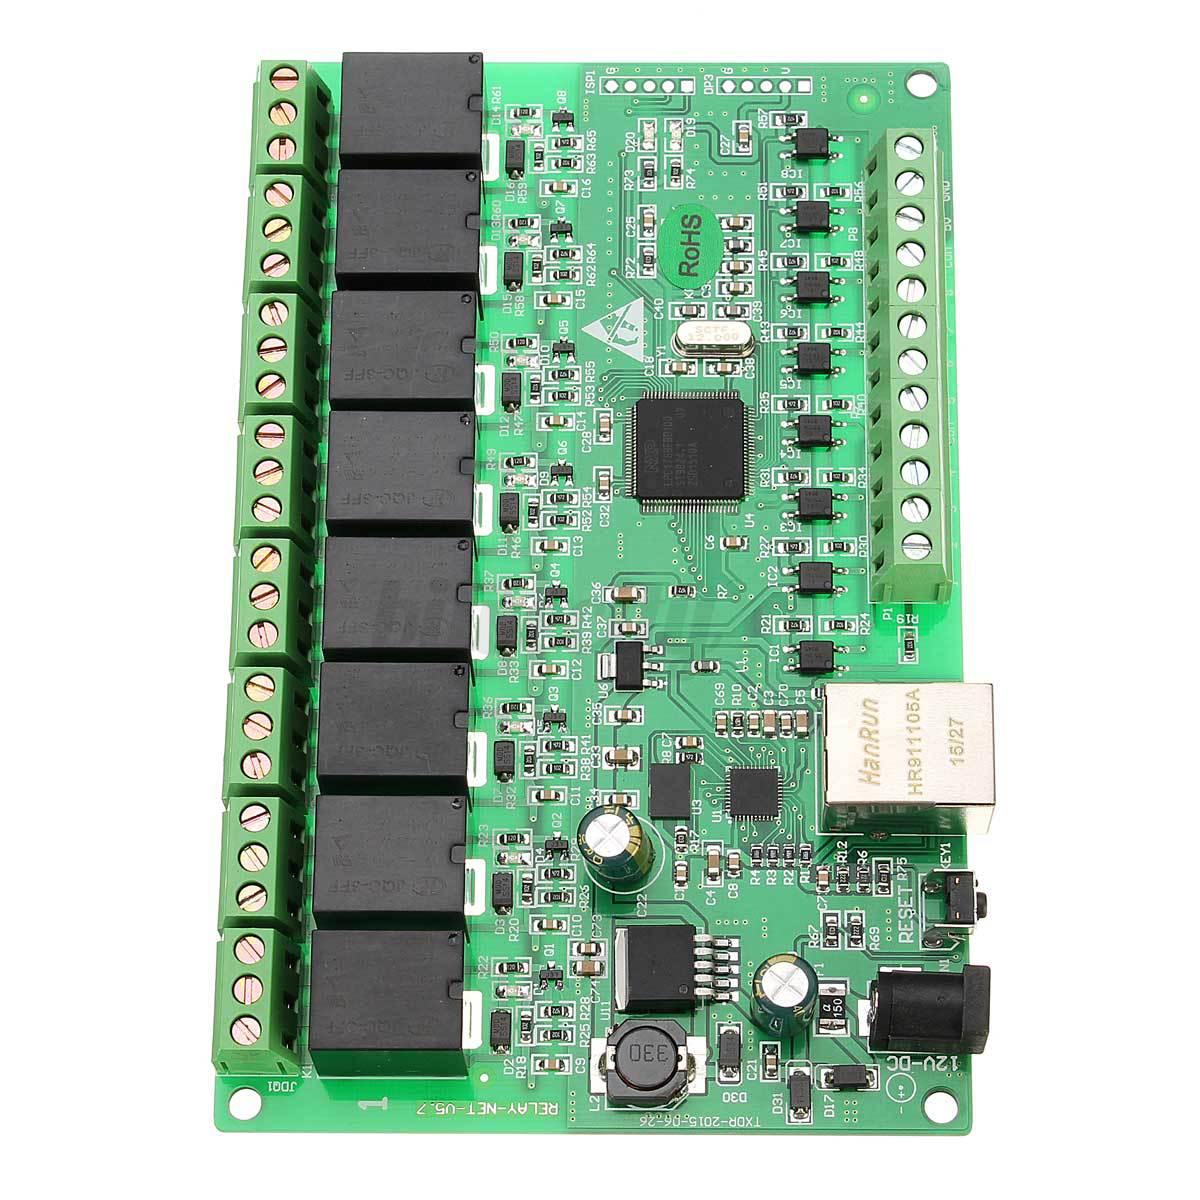 Gregs Network Relay Board 8 Channel Module Wiring Diagram How